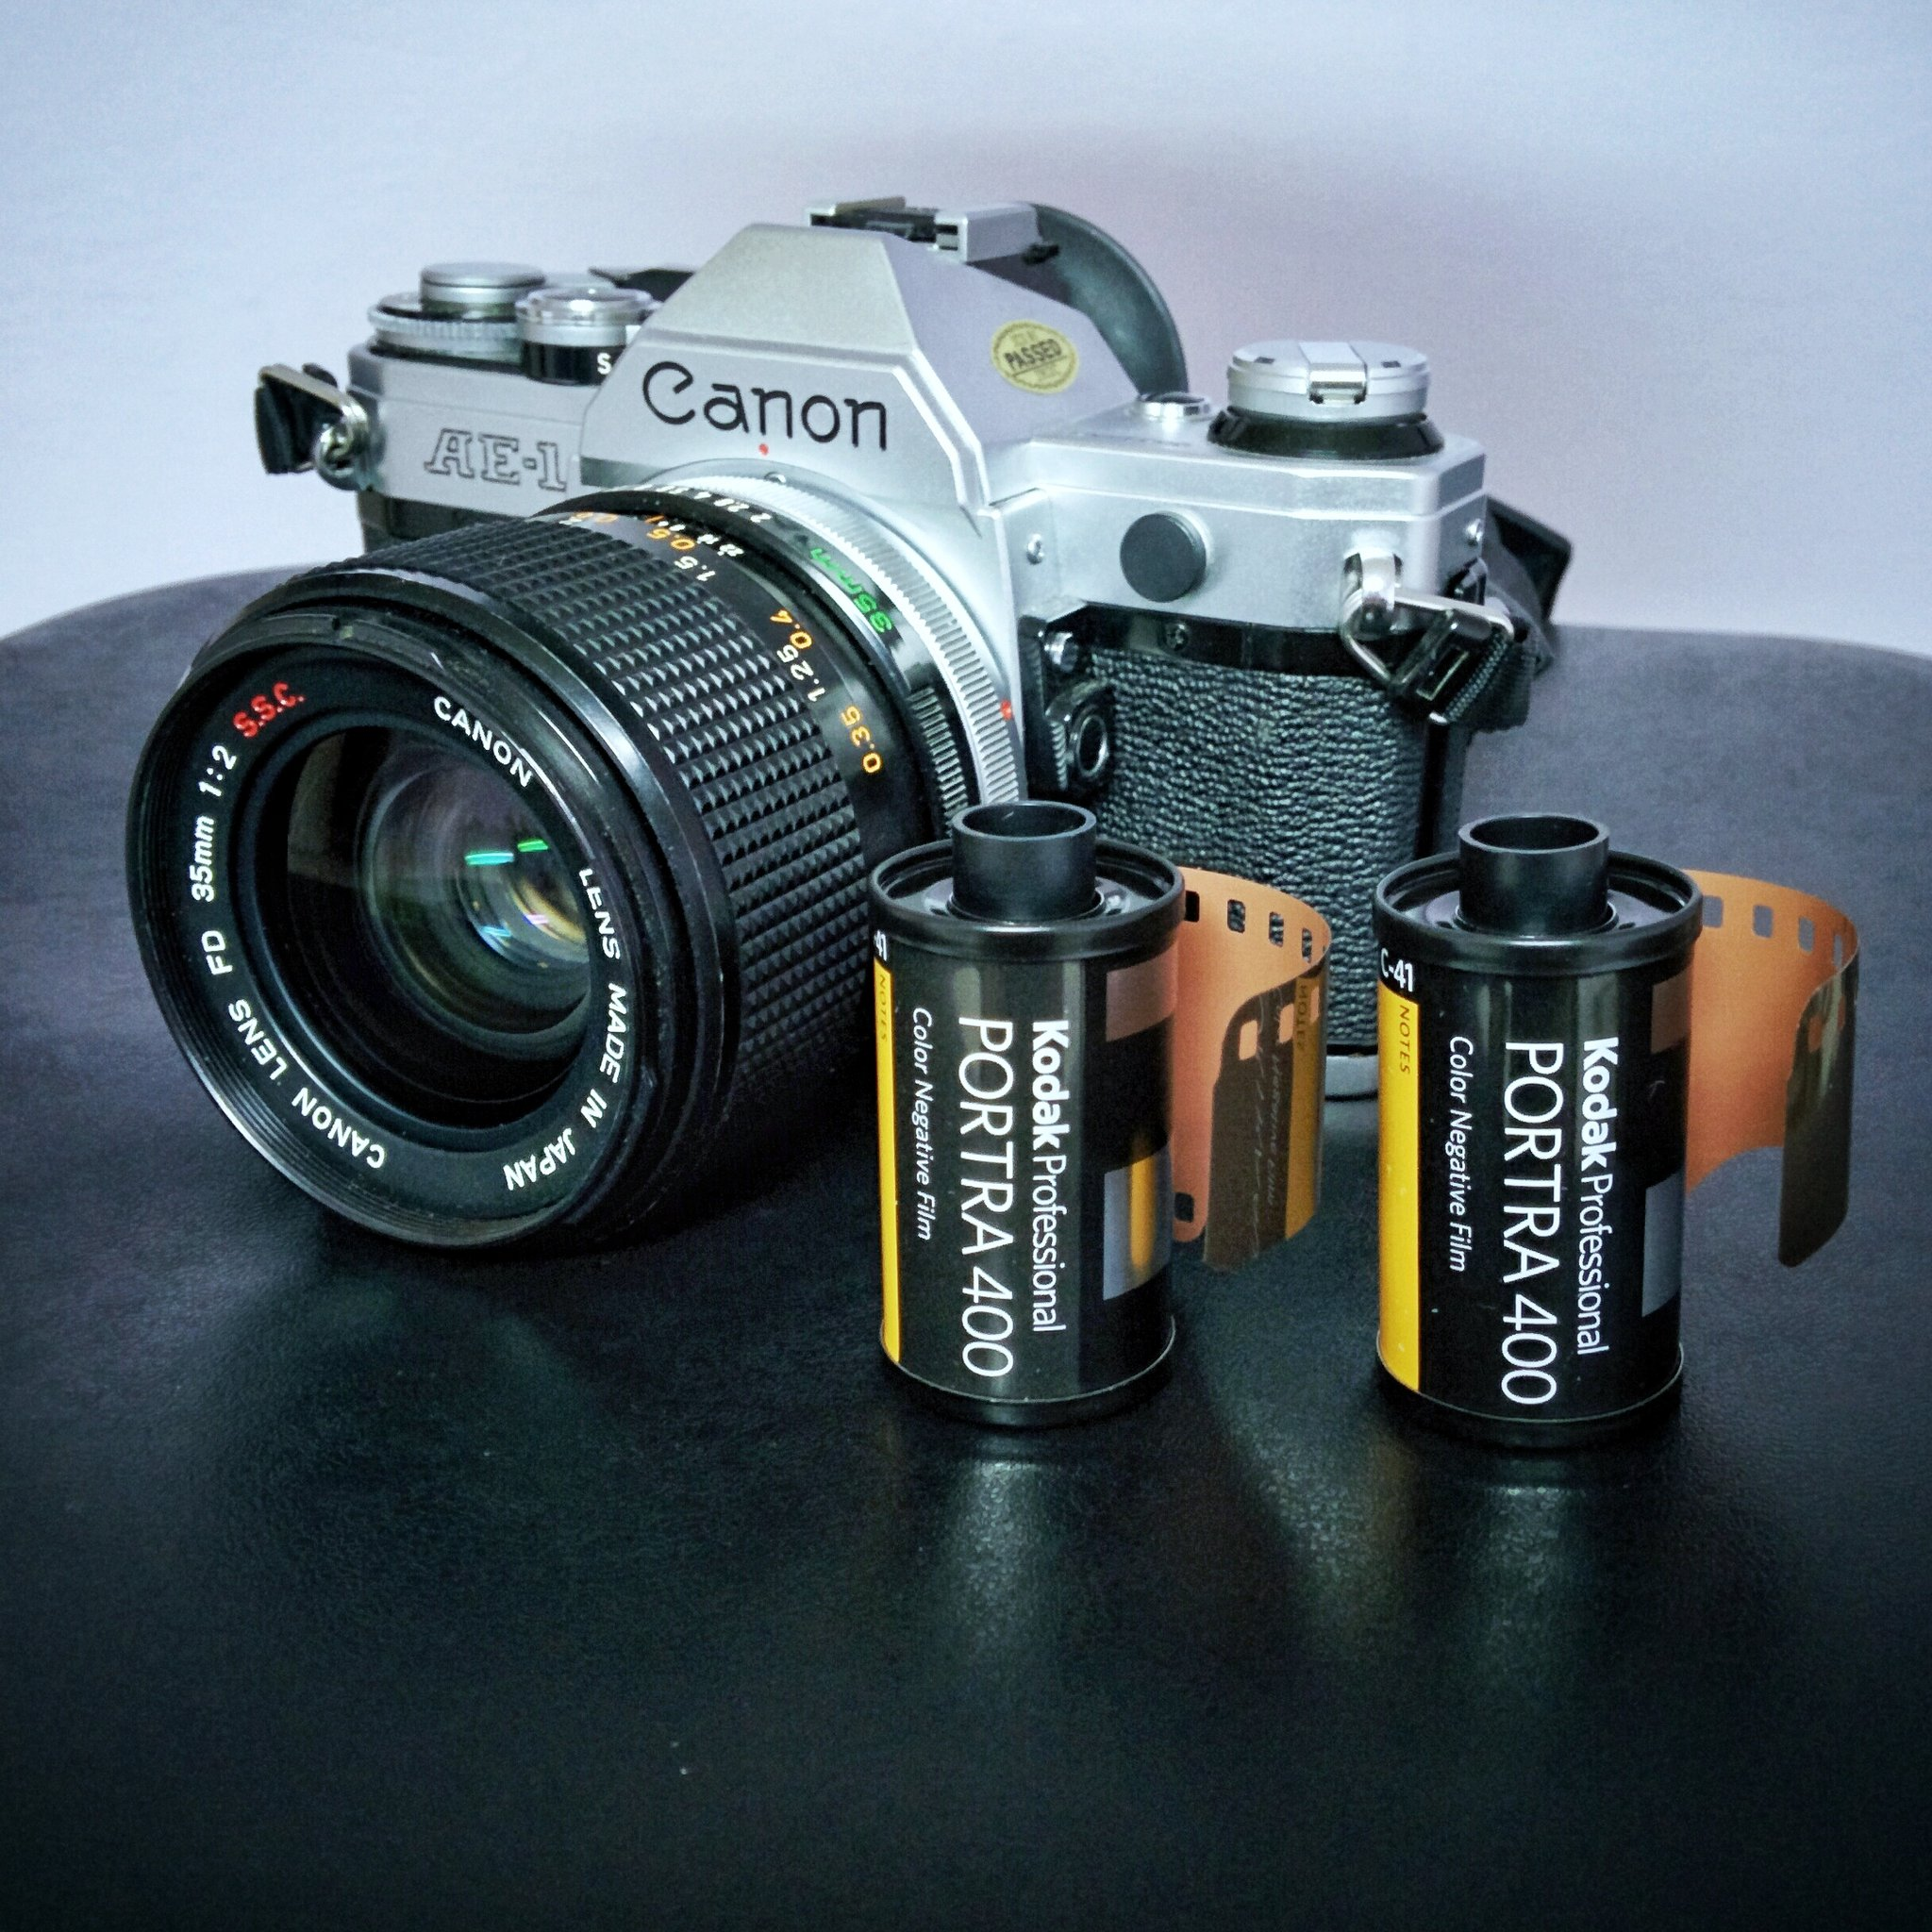 kodak-portra-400-canon-ae-1-krista-michaels.jpg